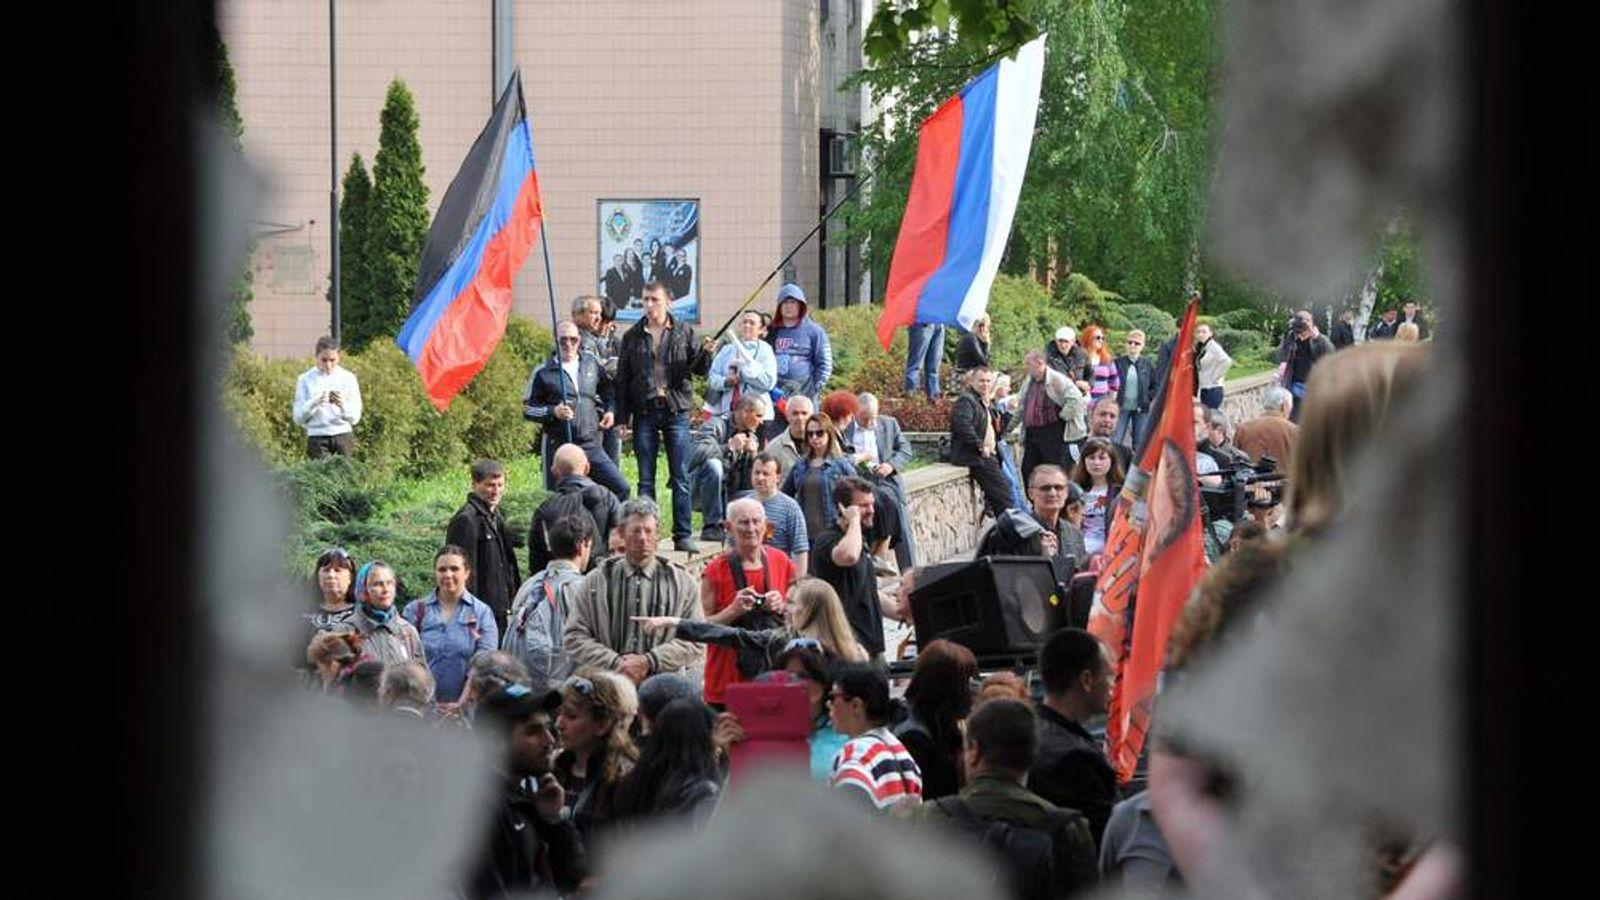 UKRAINE-RUSSIA-CRISIS-POLITICS-DONETSK